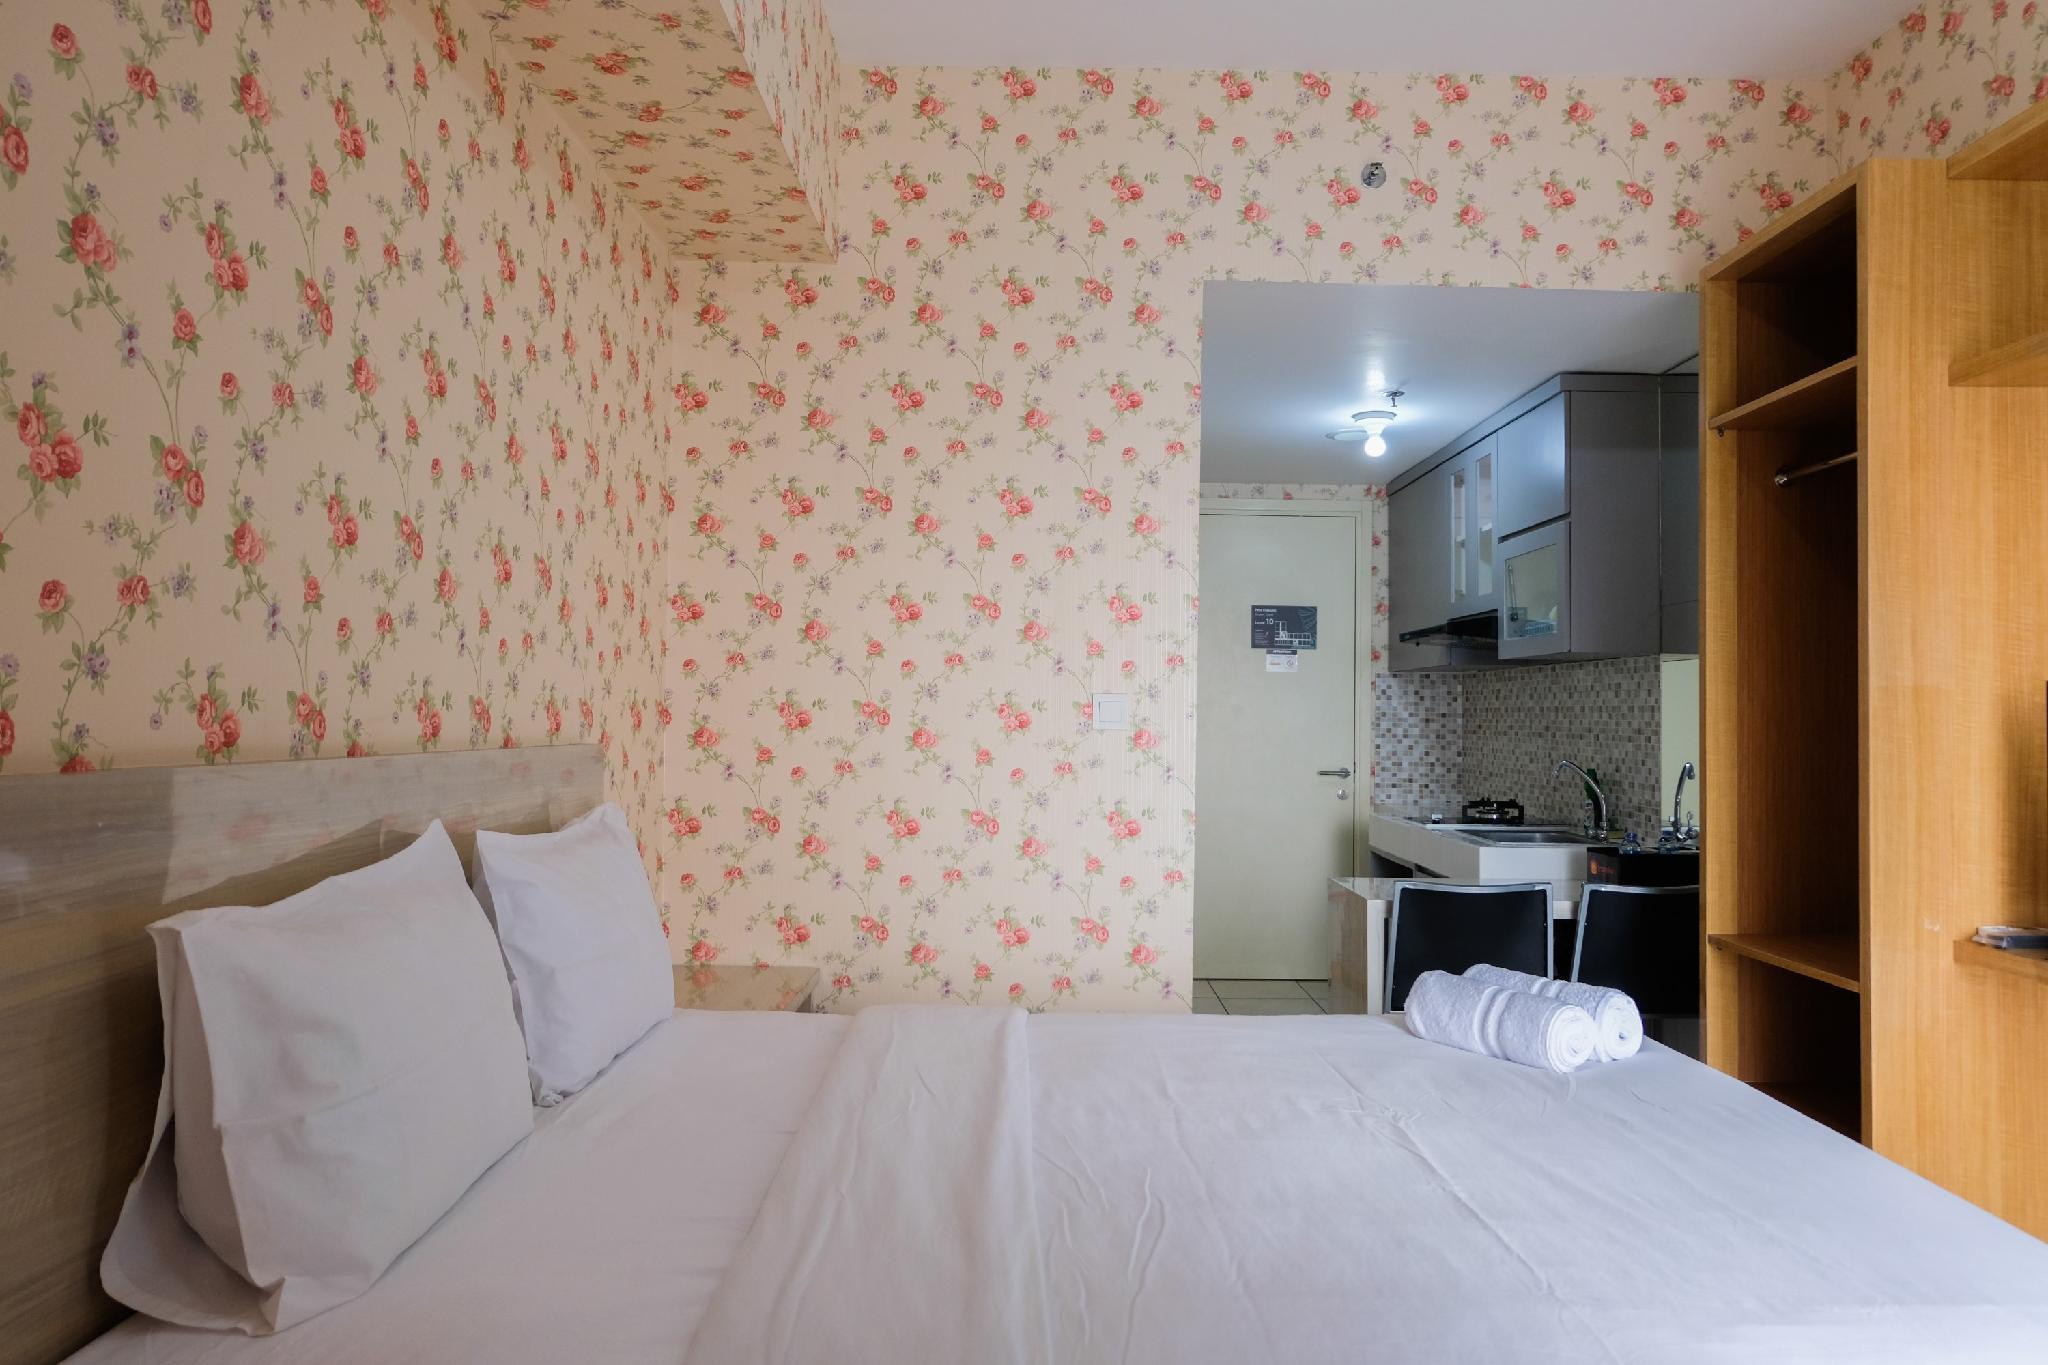 Exclusive Studio Apt @M Town Residence By Travelio